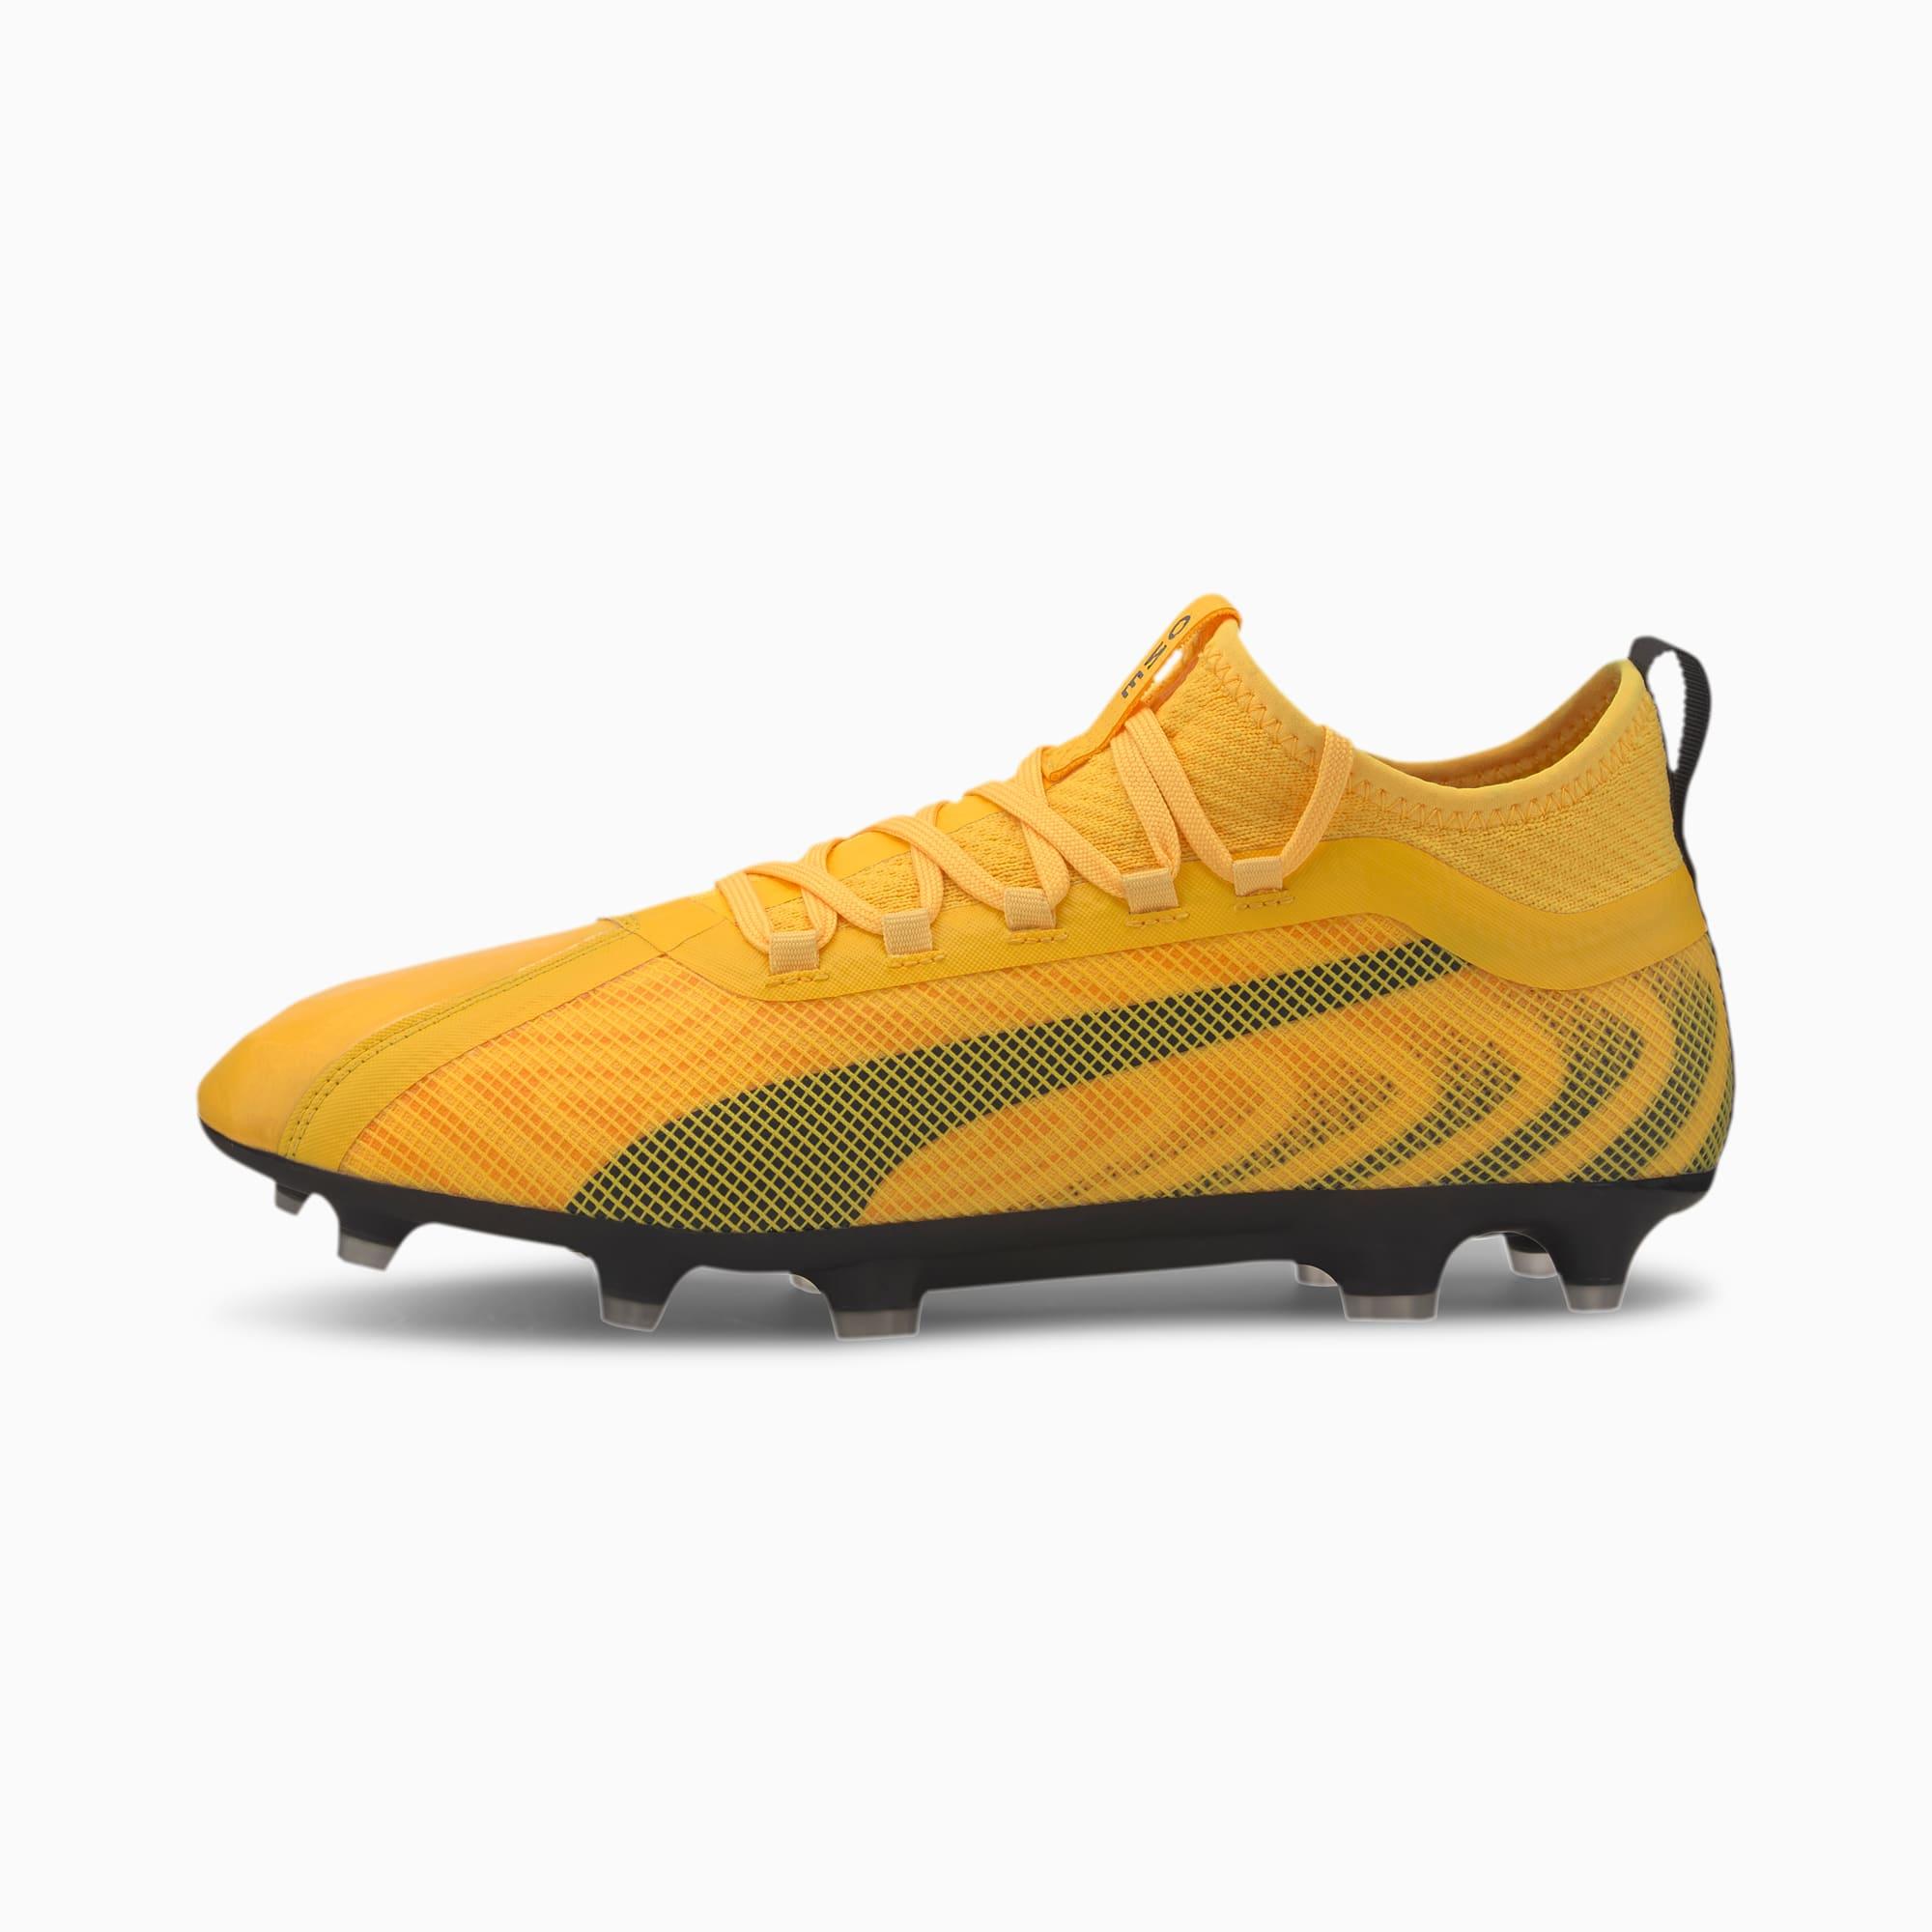 PUMA ONE 20.2 FG/AG Men's Football Boots